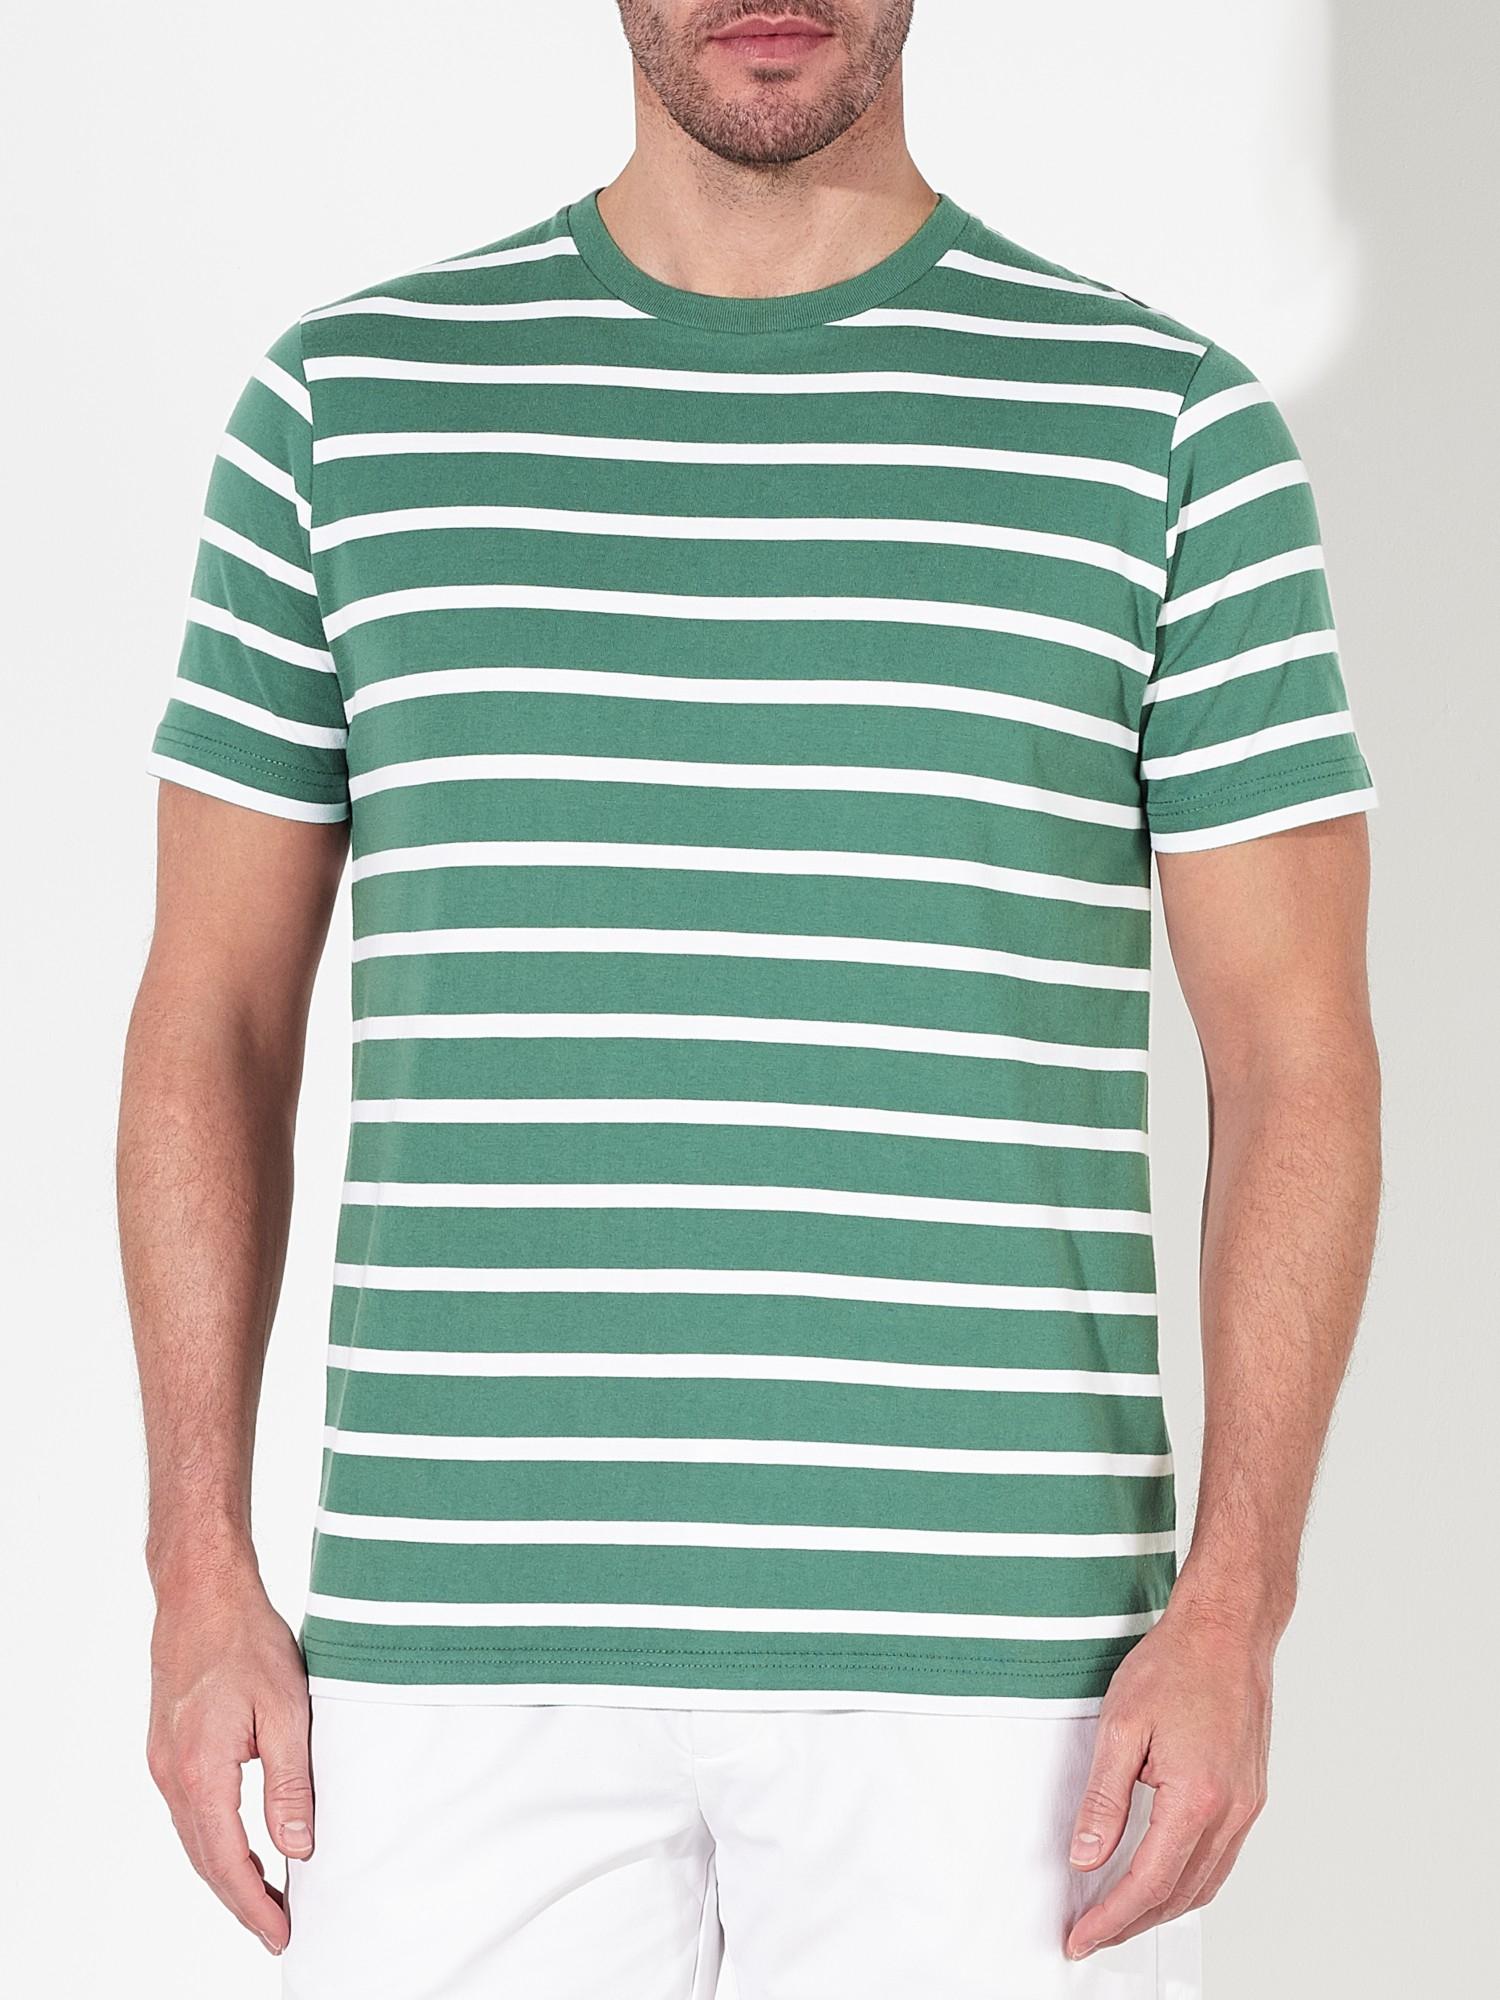 john lewis organic cotton breton stripe t shirt in white. Black Bedroom Furniture Sets. Home Design Ideas